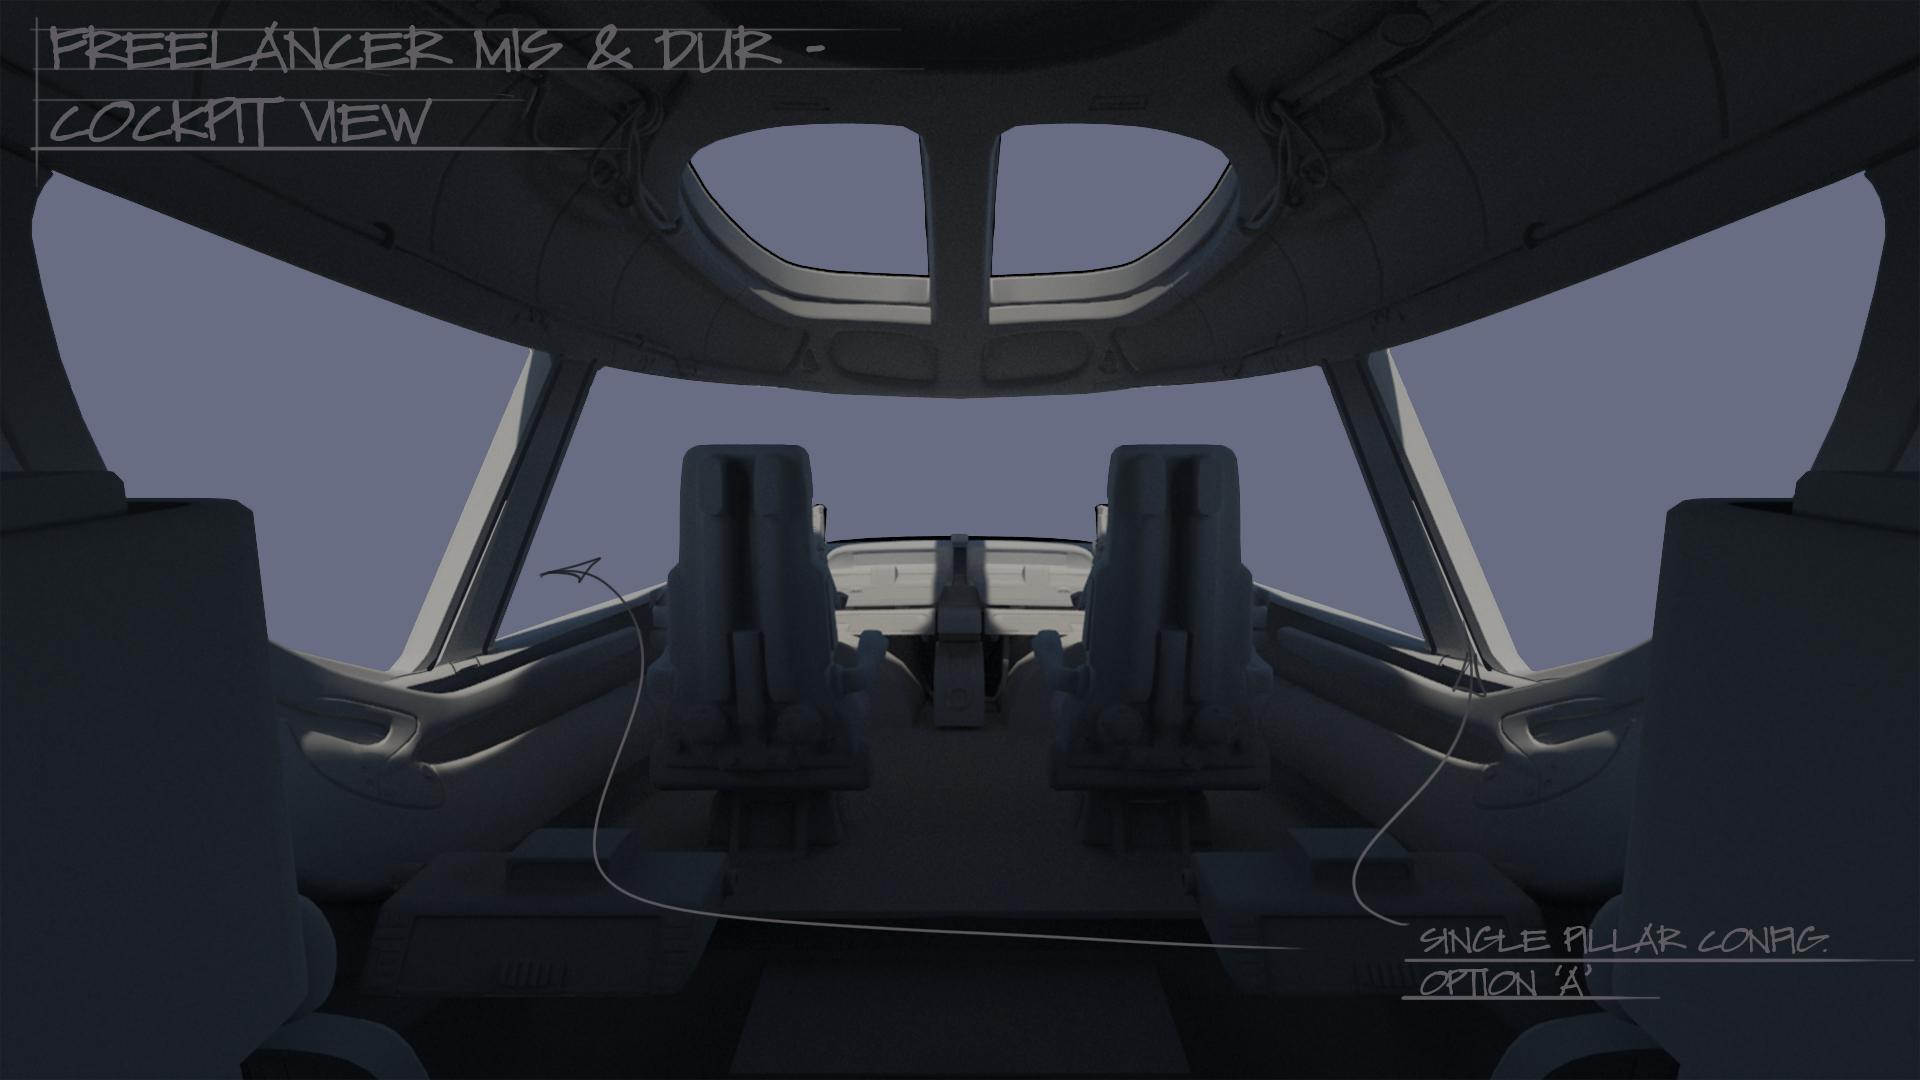 FreelancerMIS-DUR_CockpitView_OptA_Hobbi